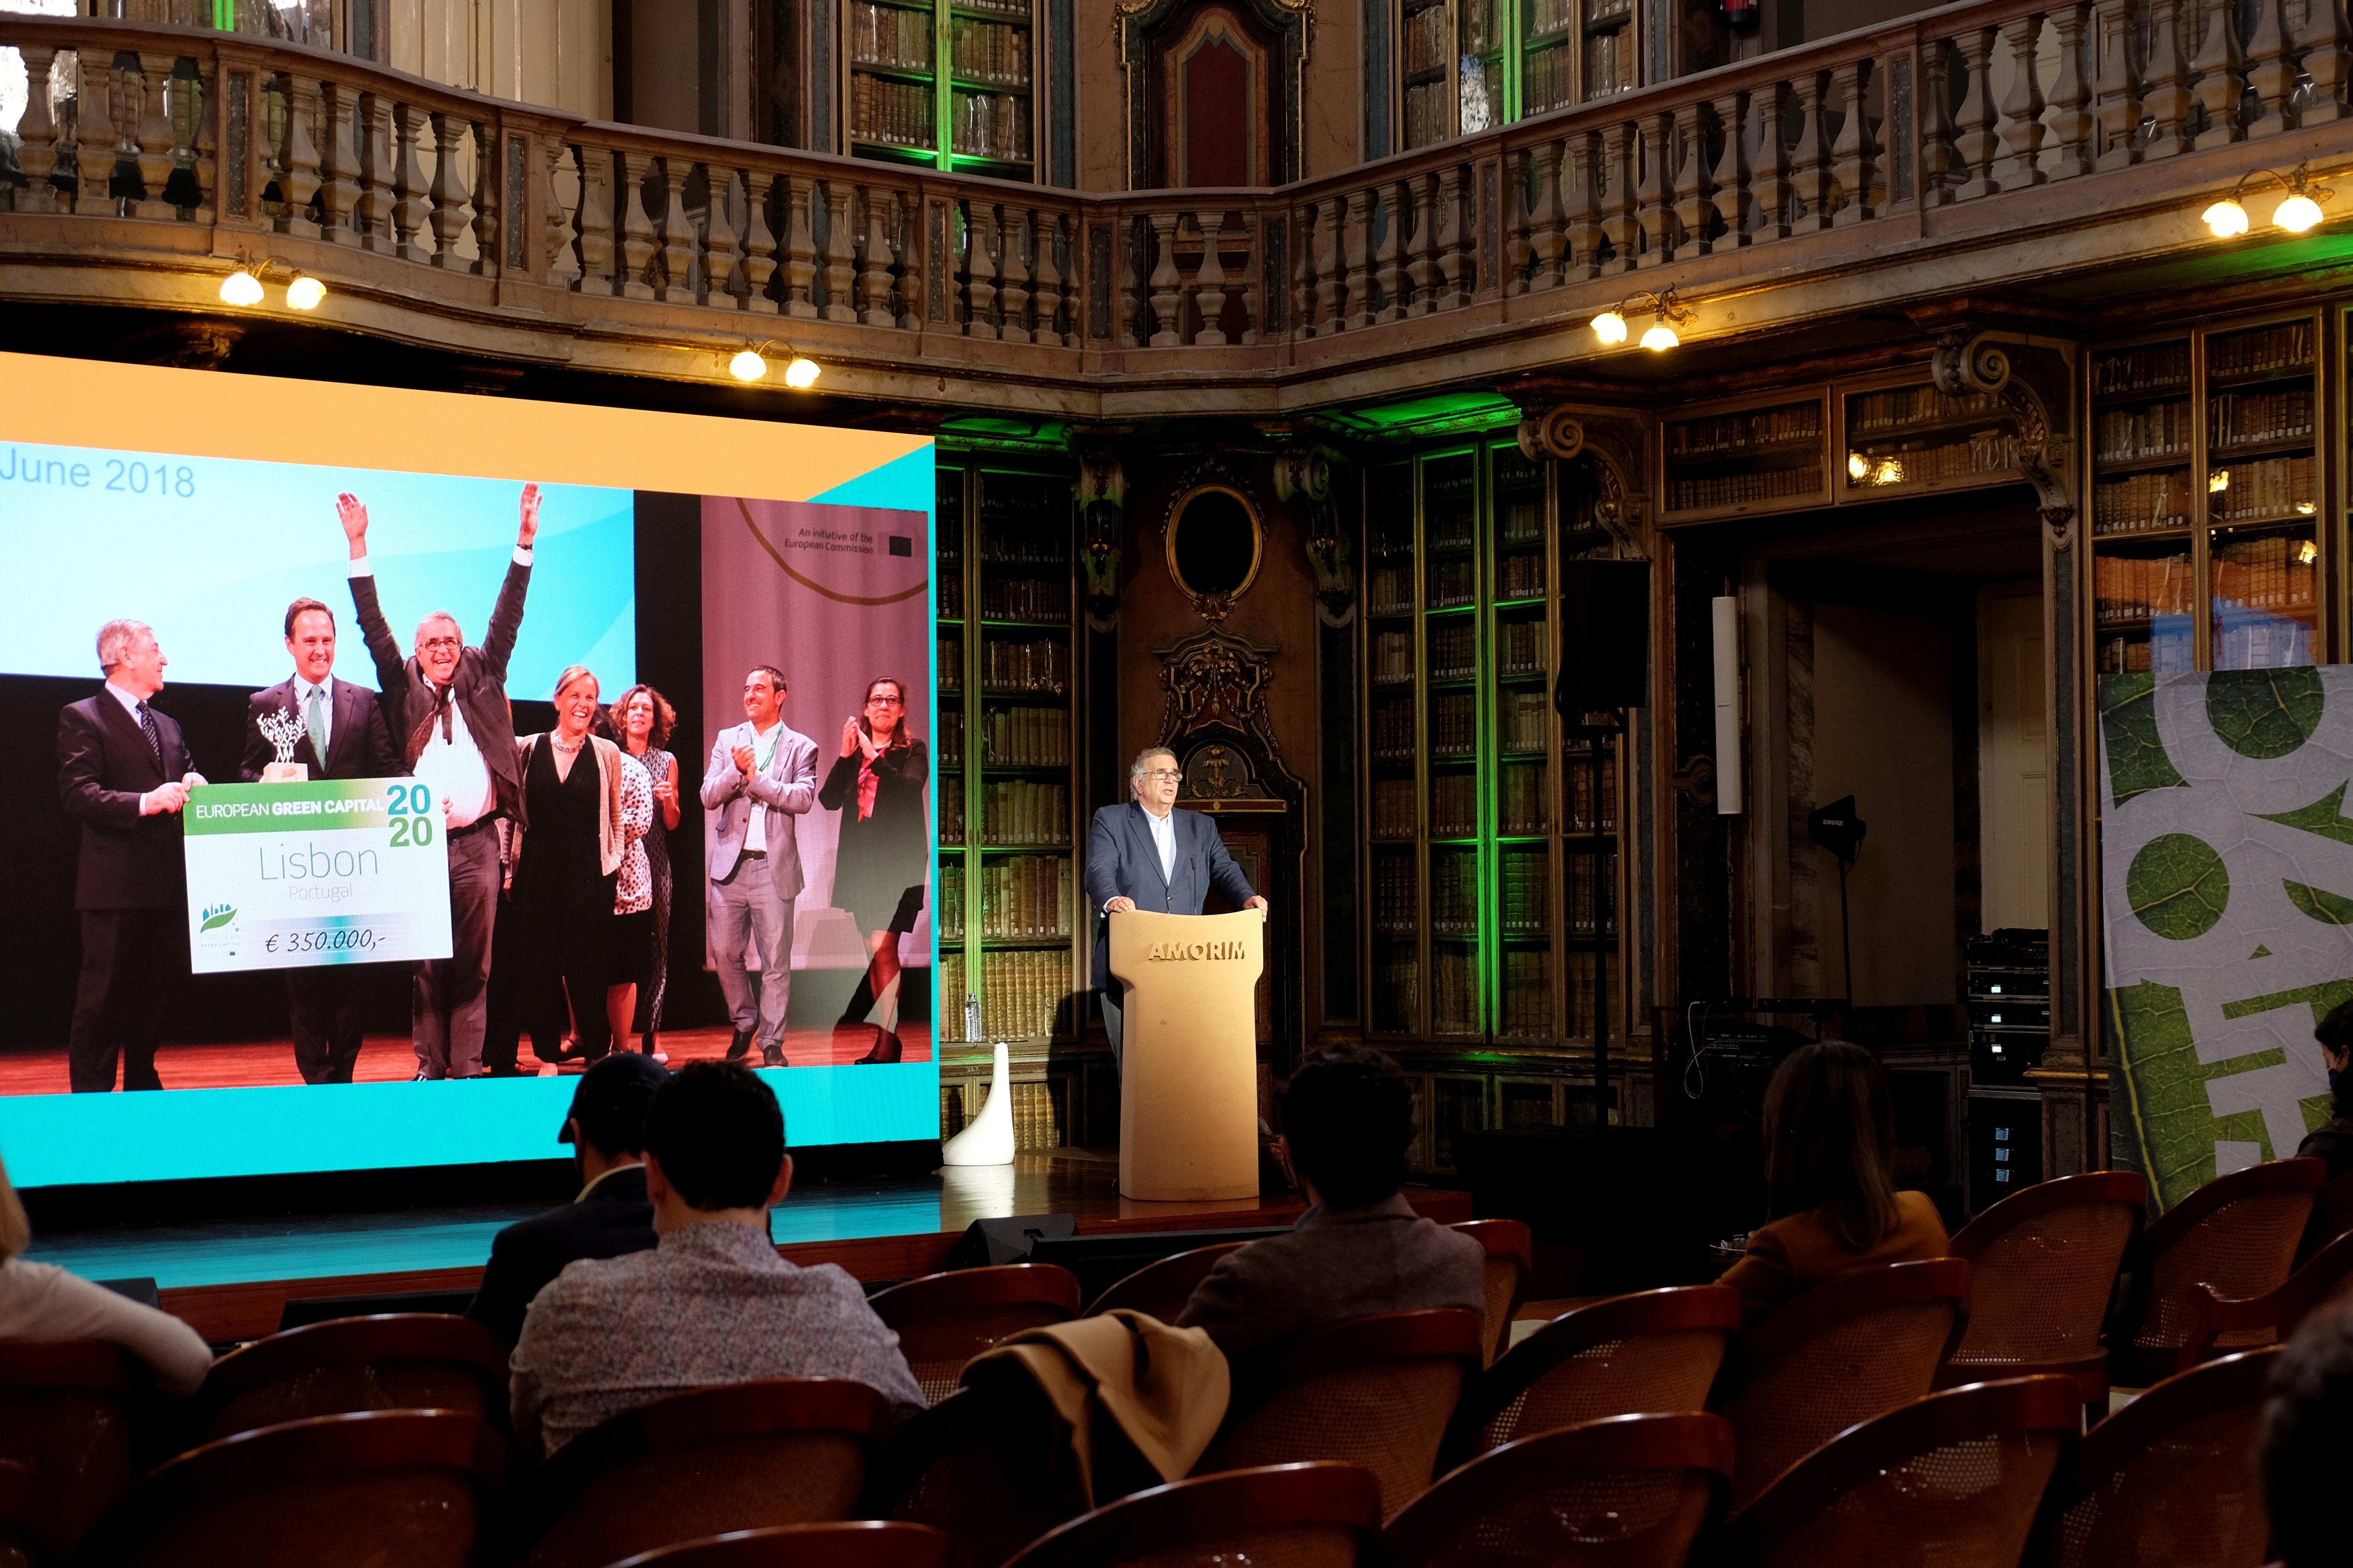 Lisbon named Europe's green capital 2020